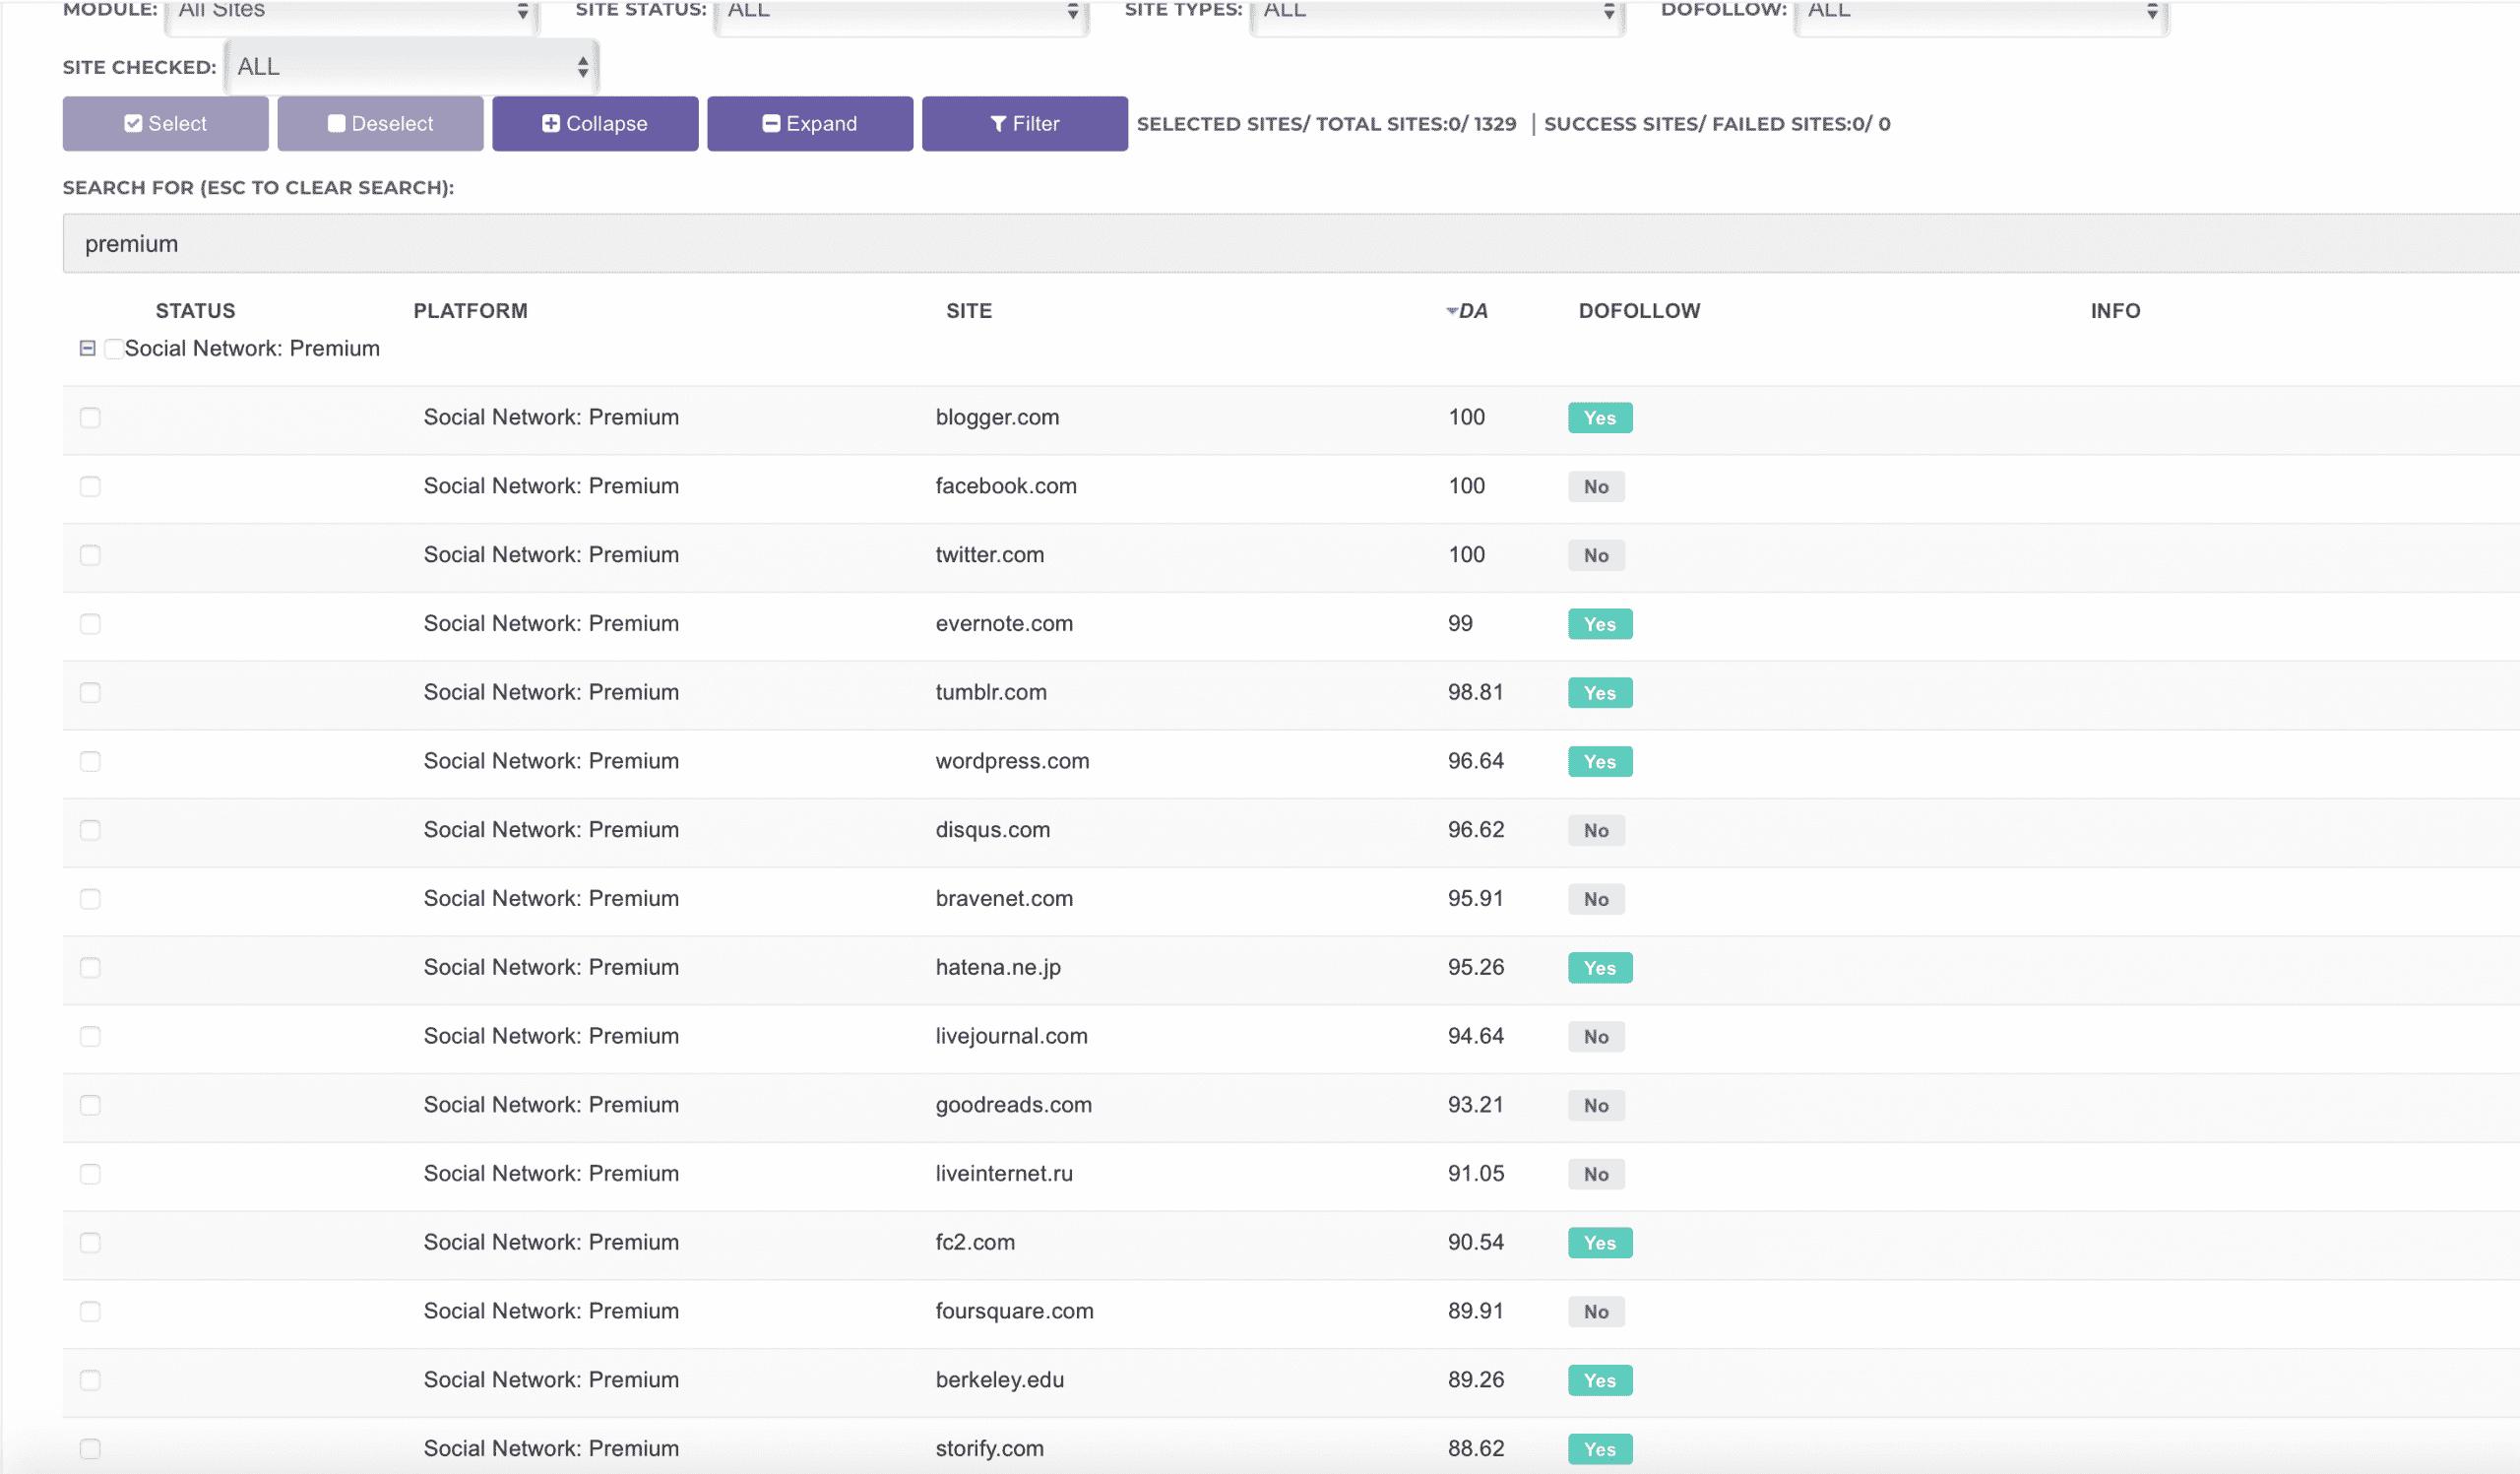 Web 2.0 Websites for Rankerx